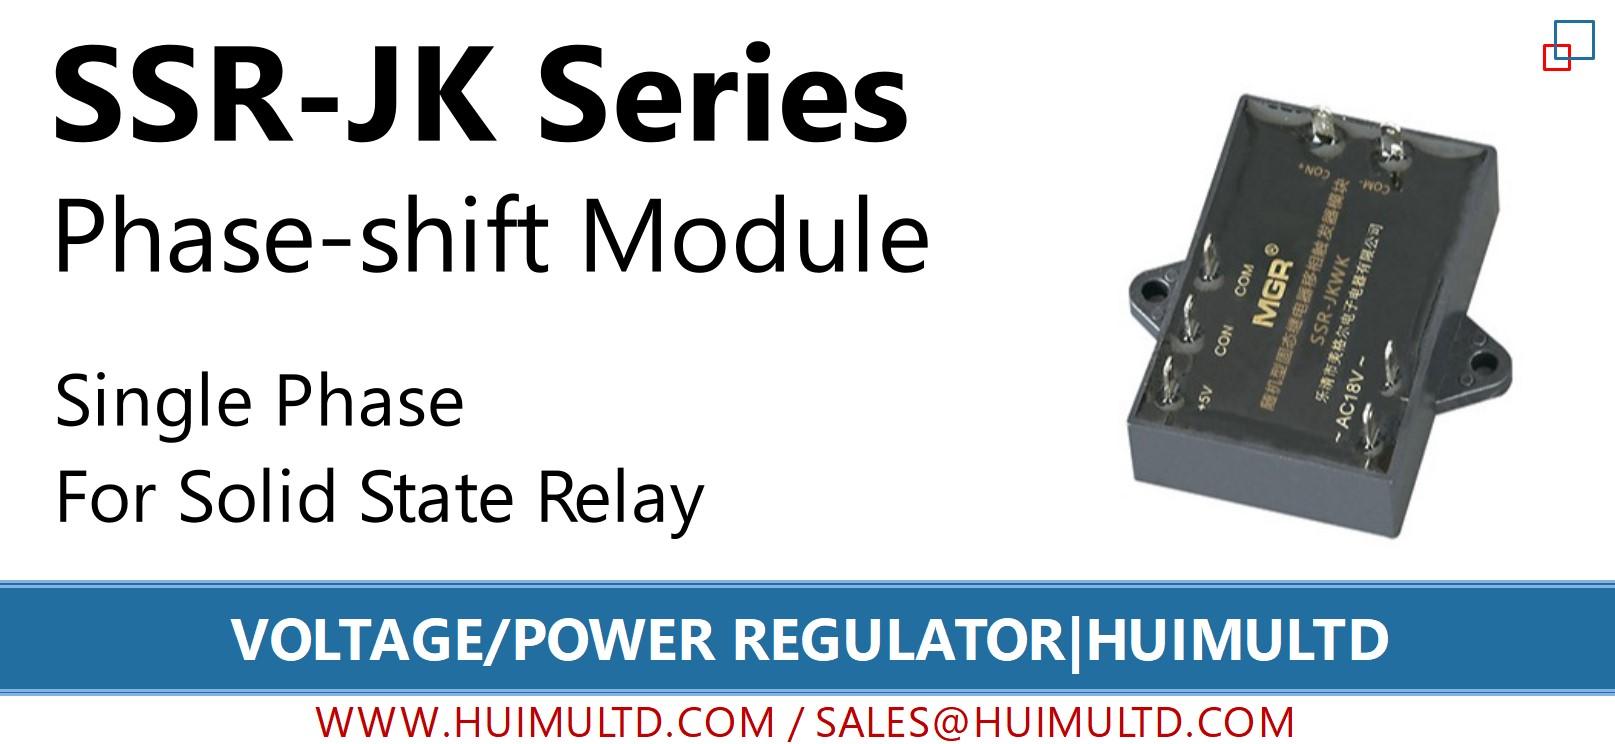 SSR-JK Series Voltage Power Regulator